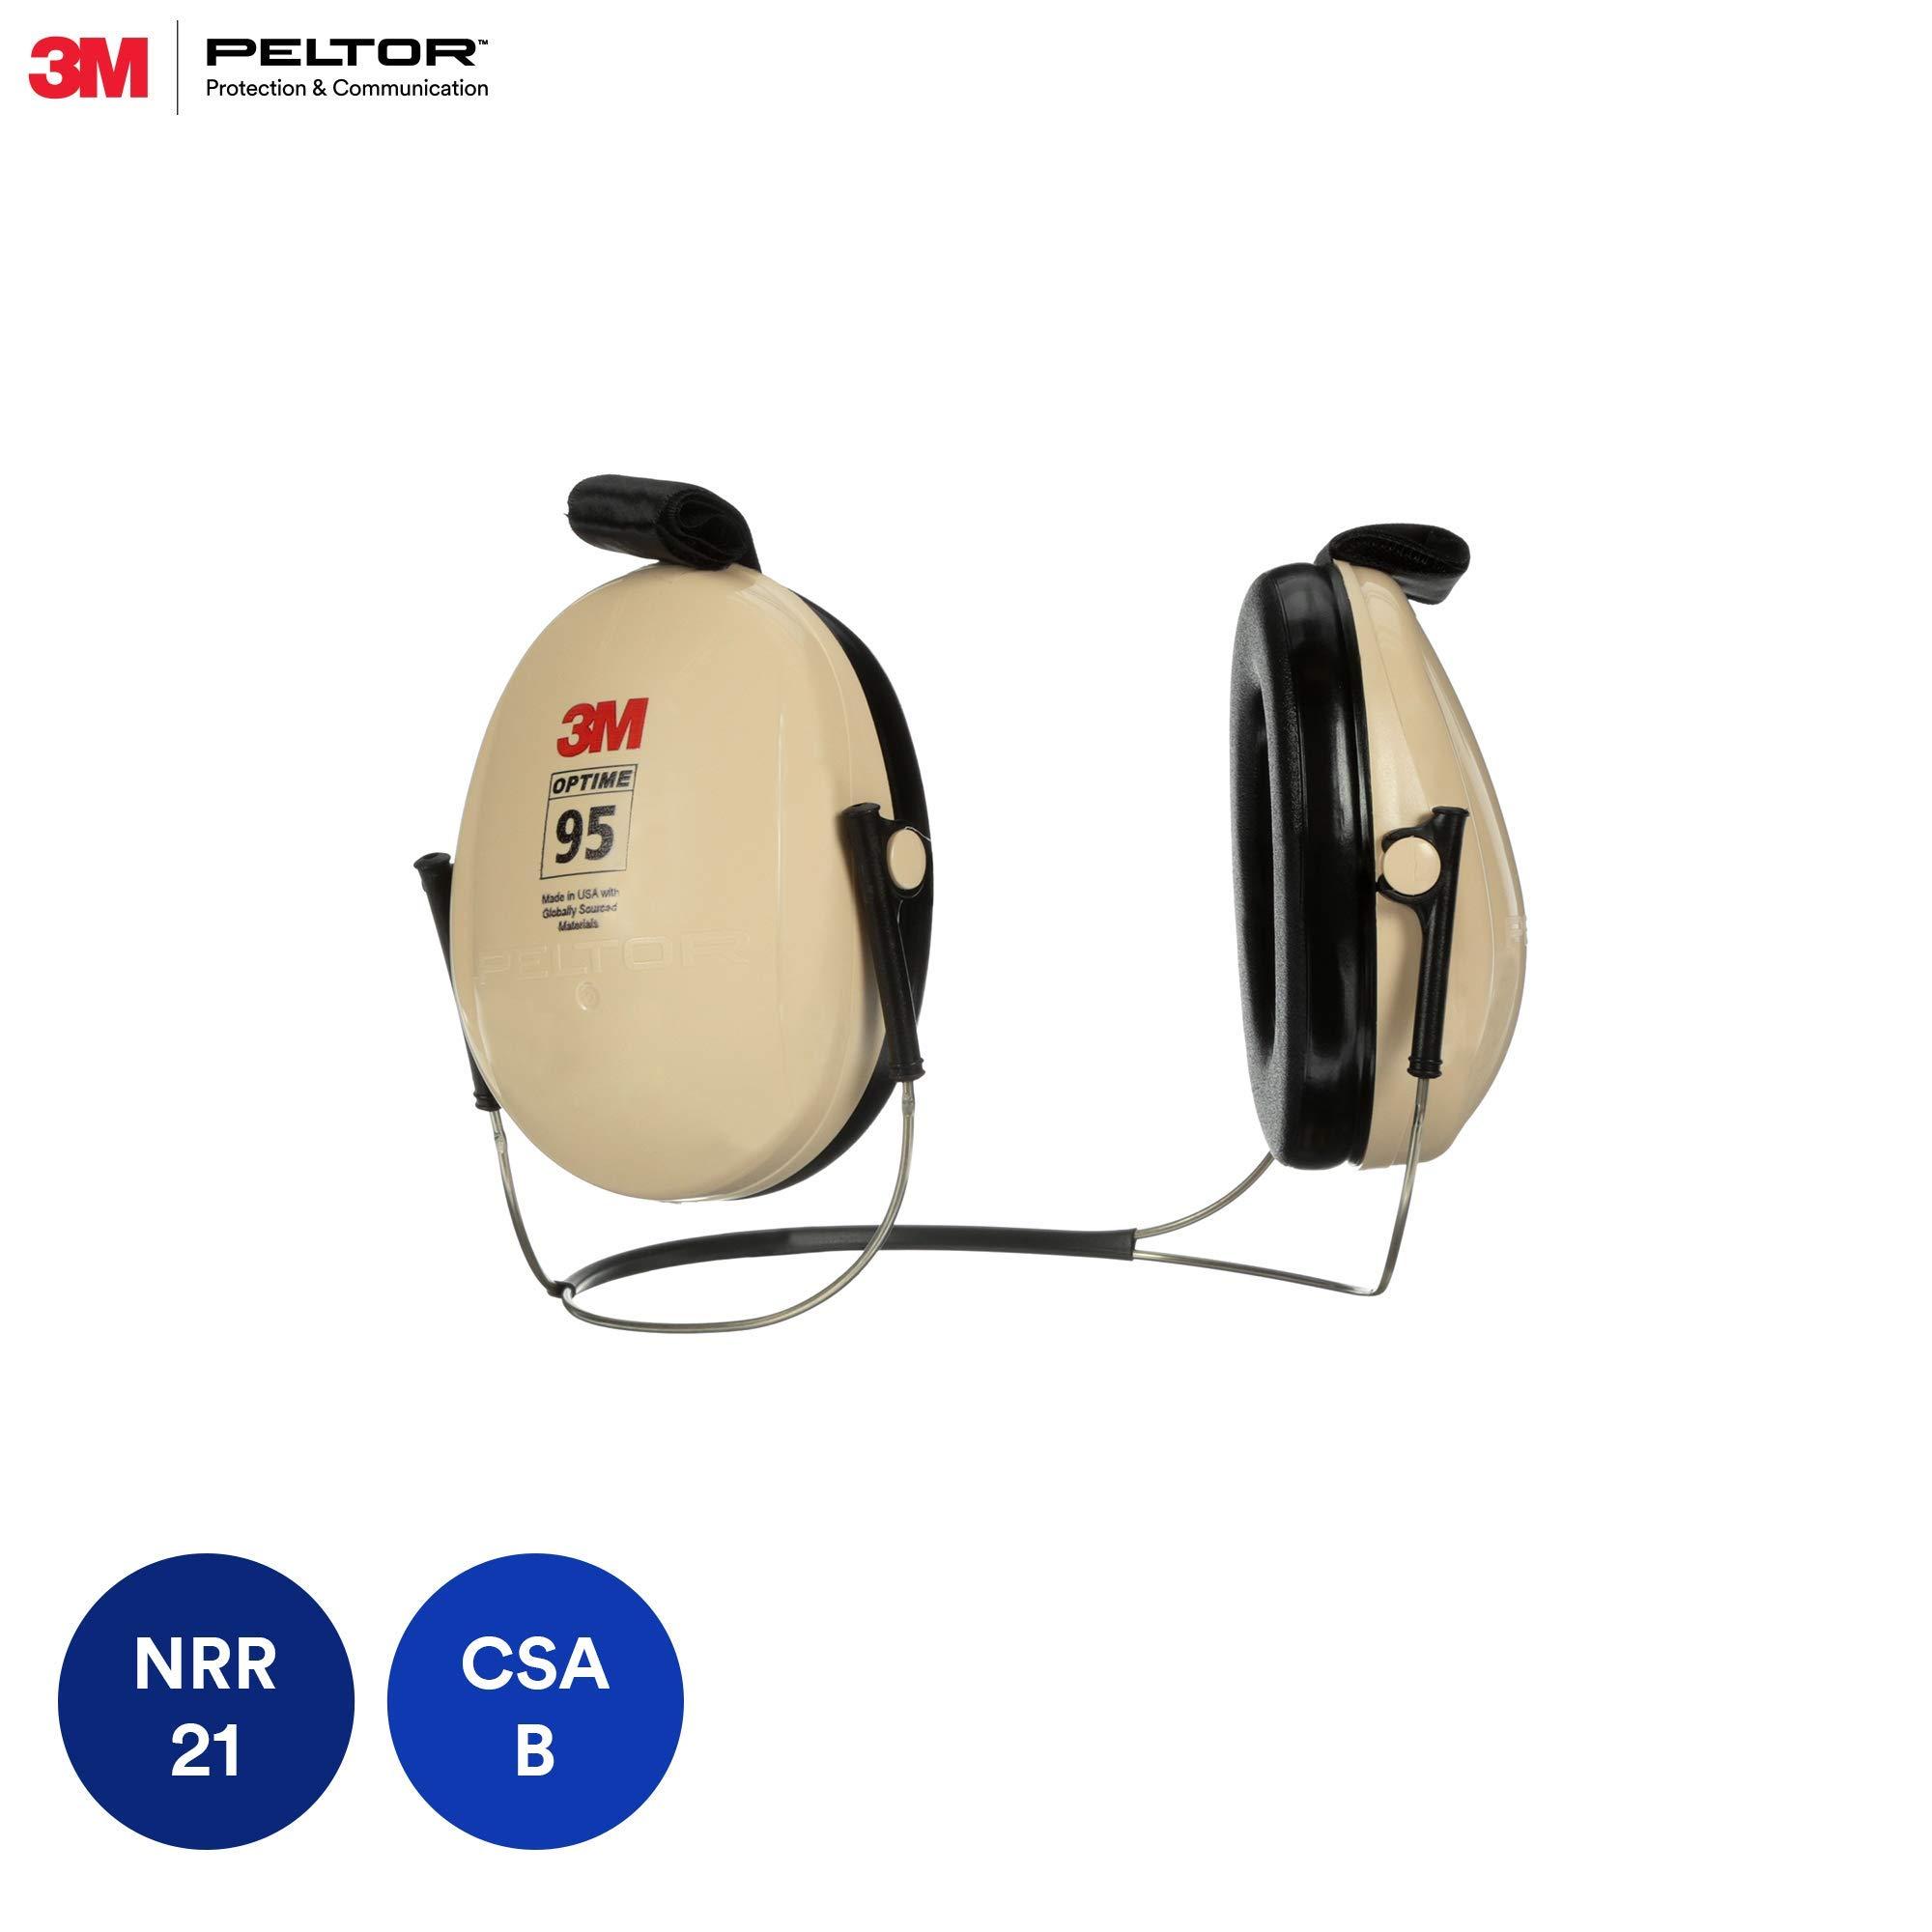 3M H6B/V Peltor Optime 95 Behind-the-Head Earmuffs by 3M